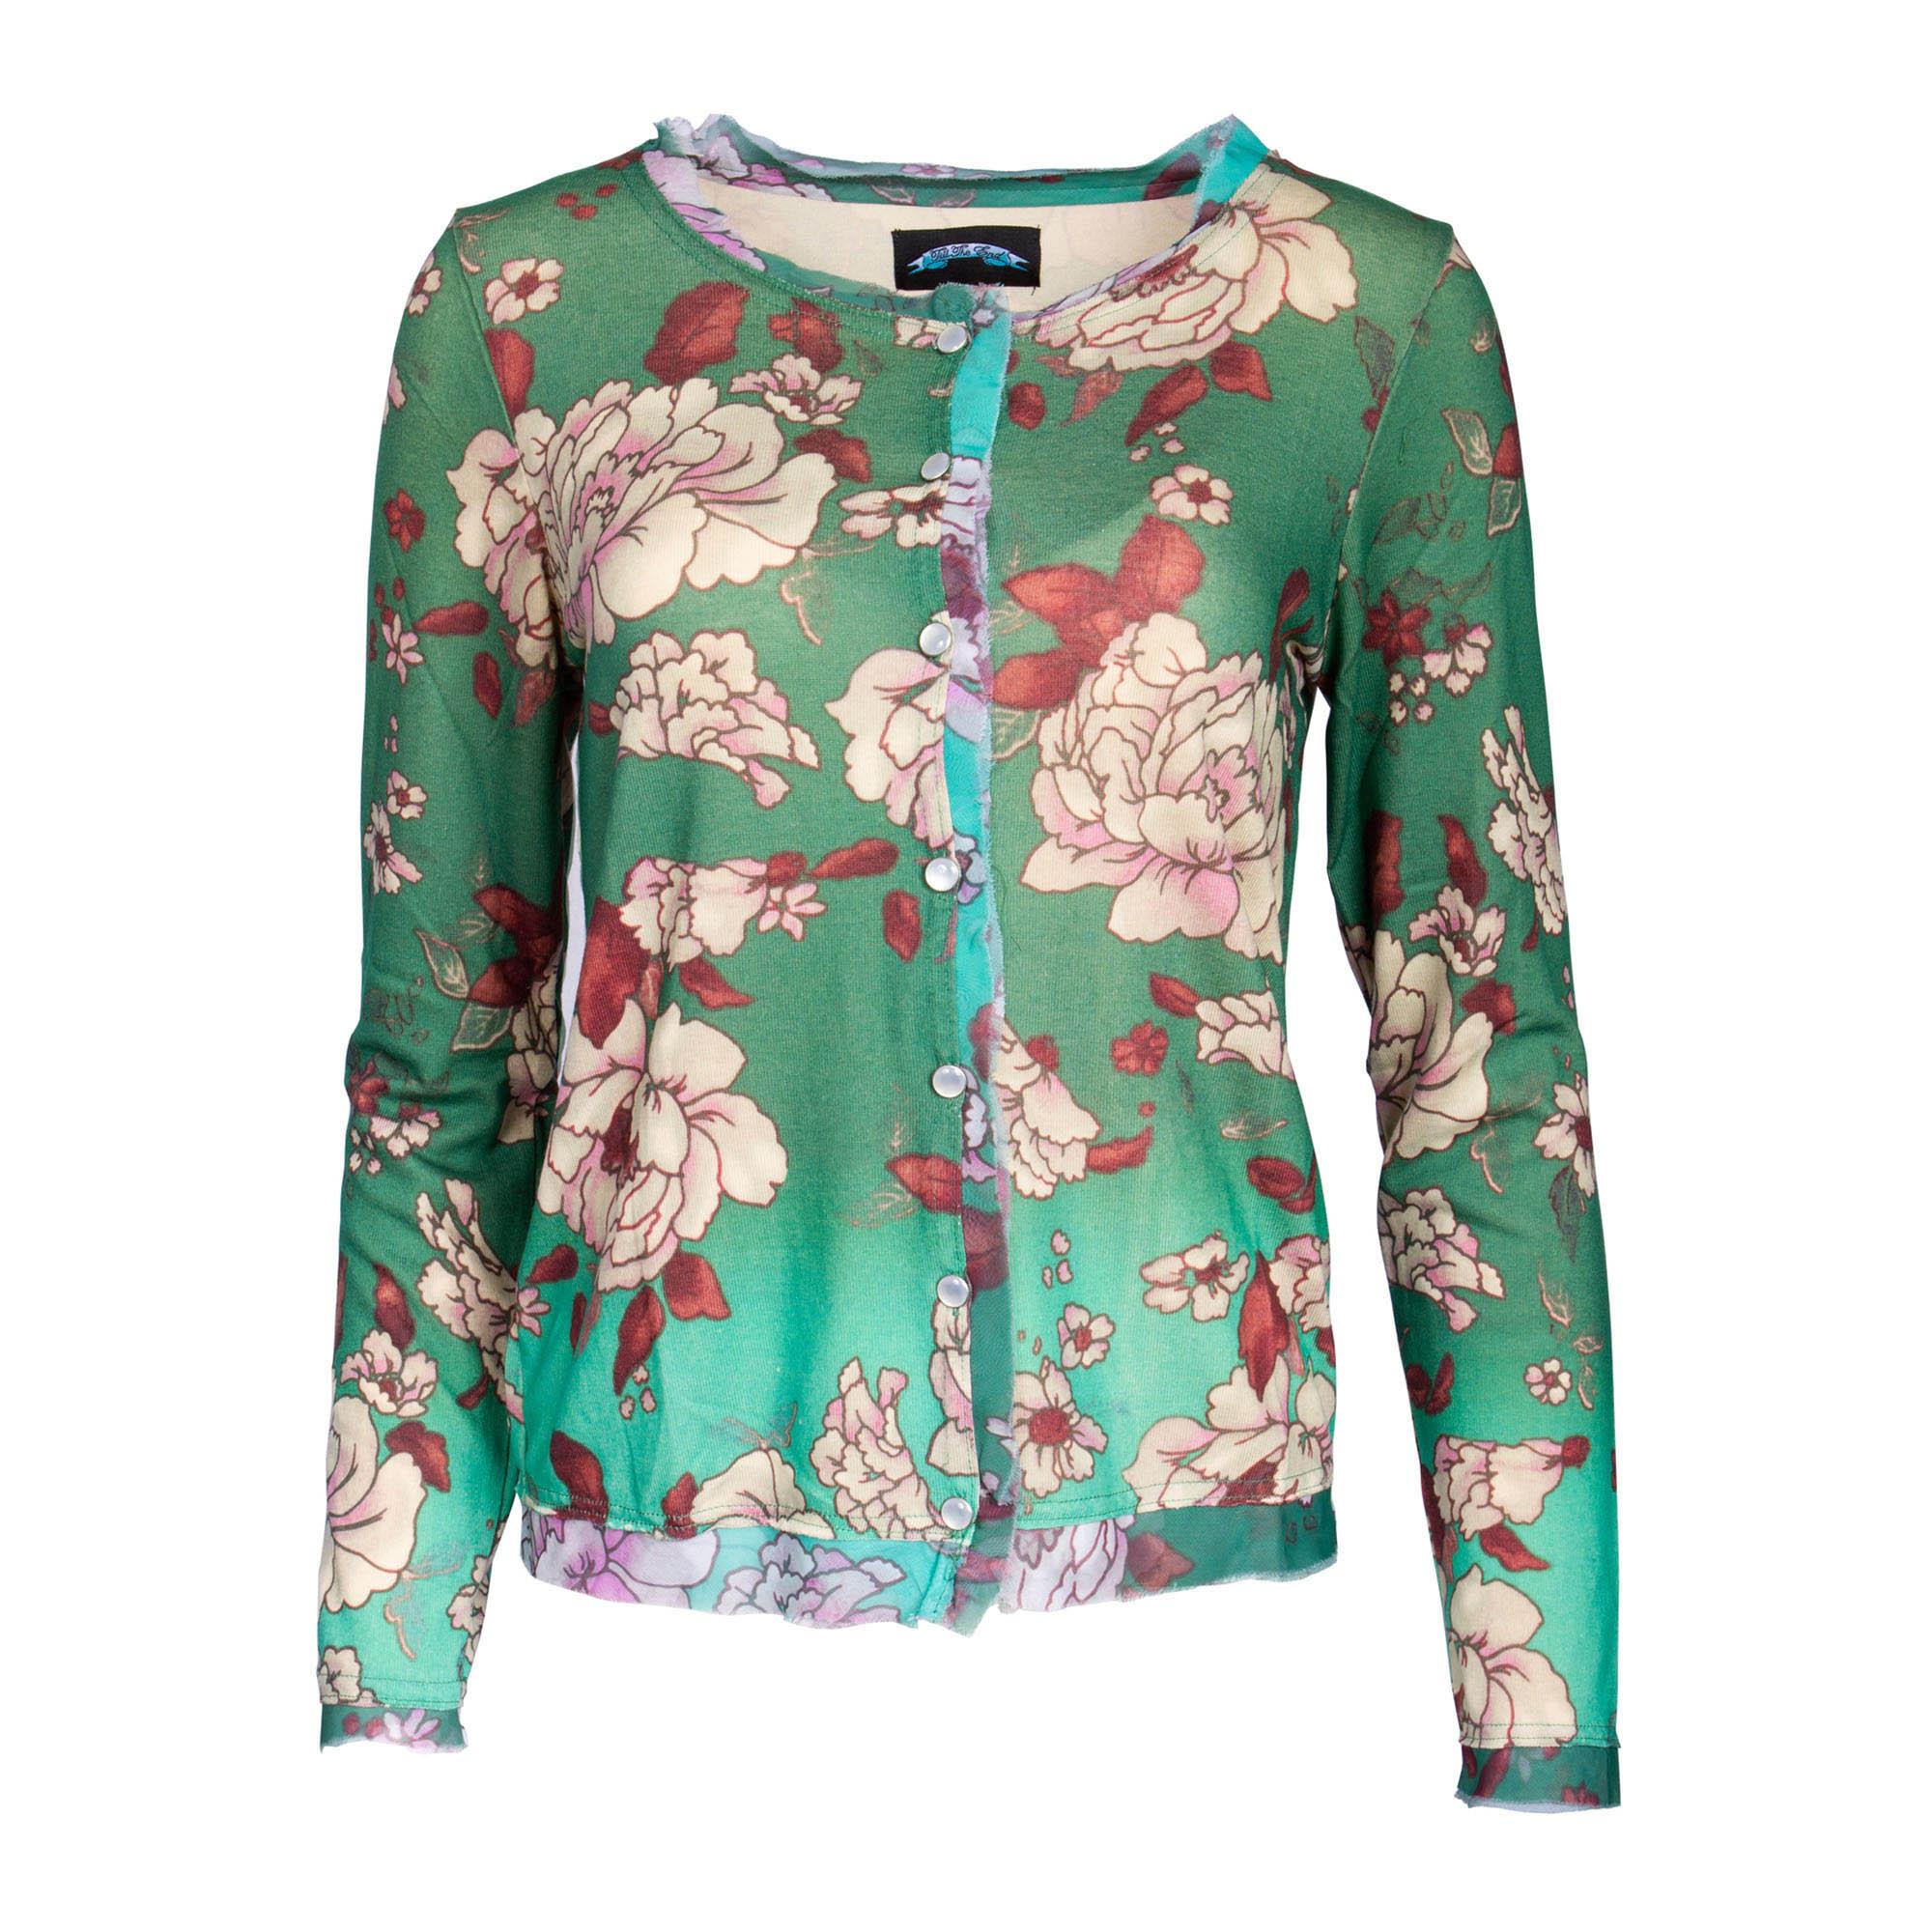 Till The End T09H06-BlueRose Till The End Women's Green Long Sleeve Button Down Top - Floral Design